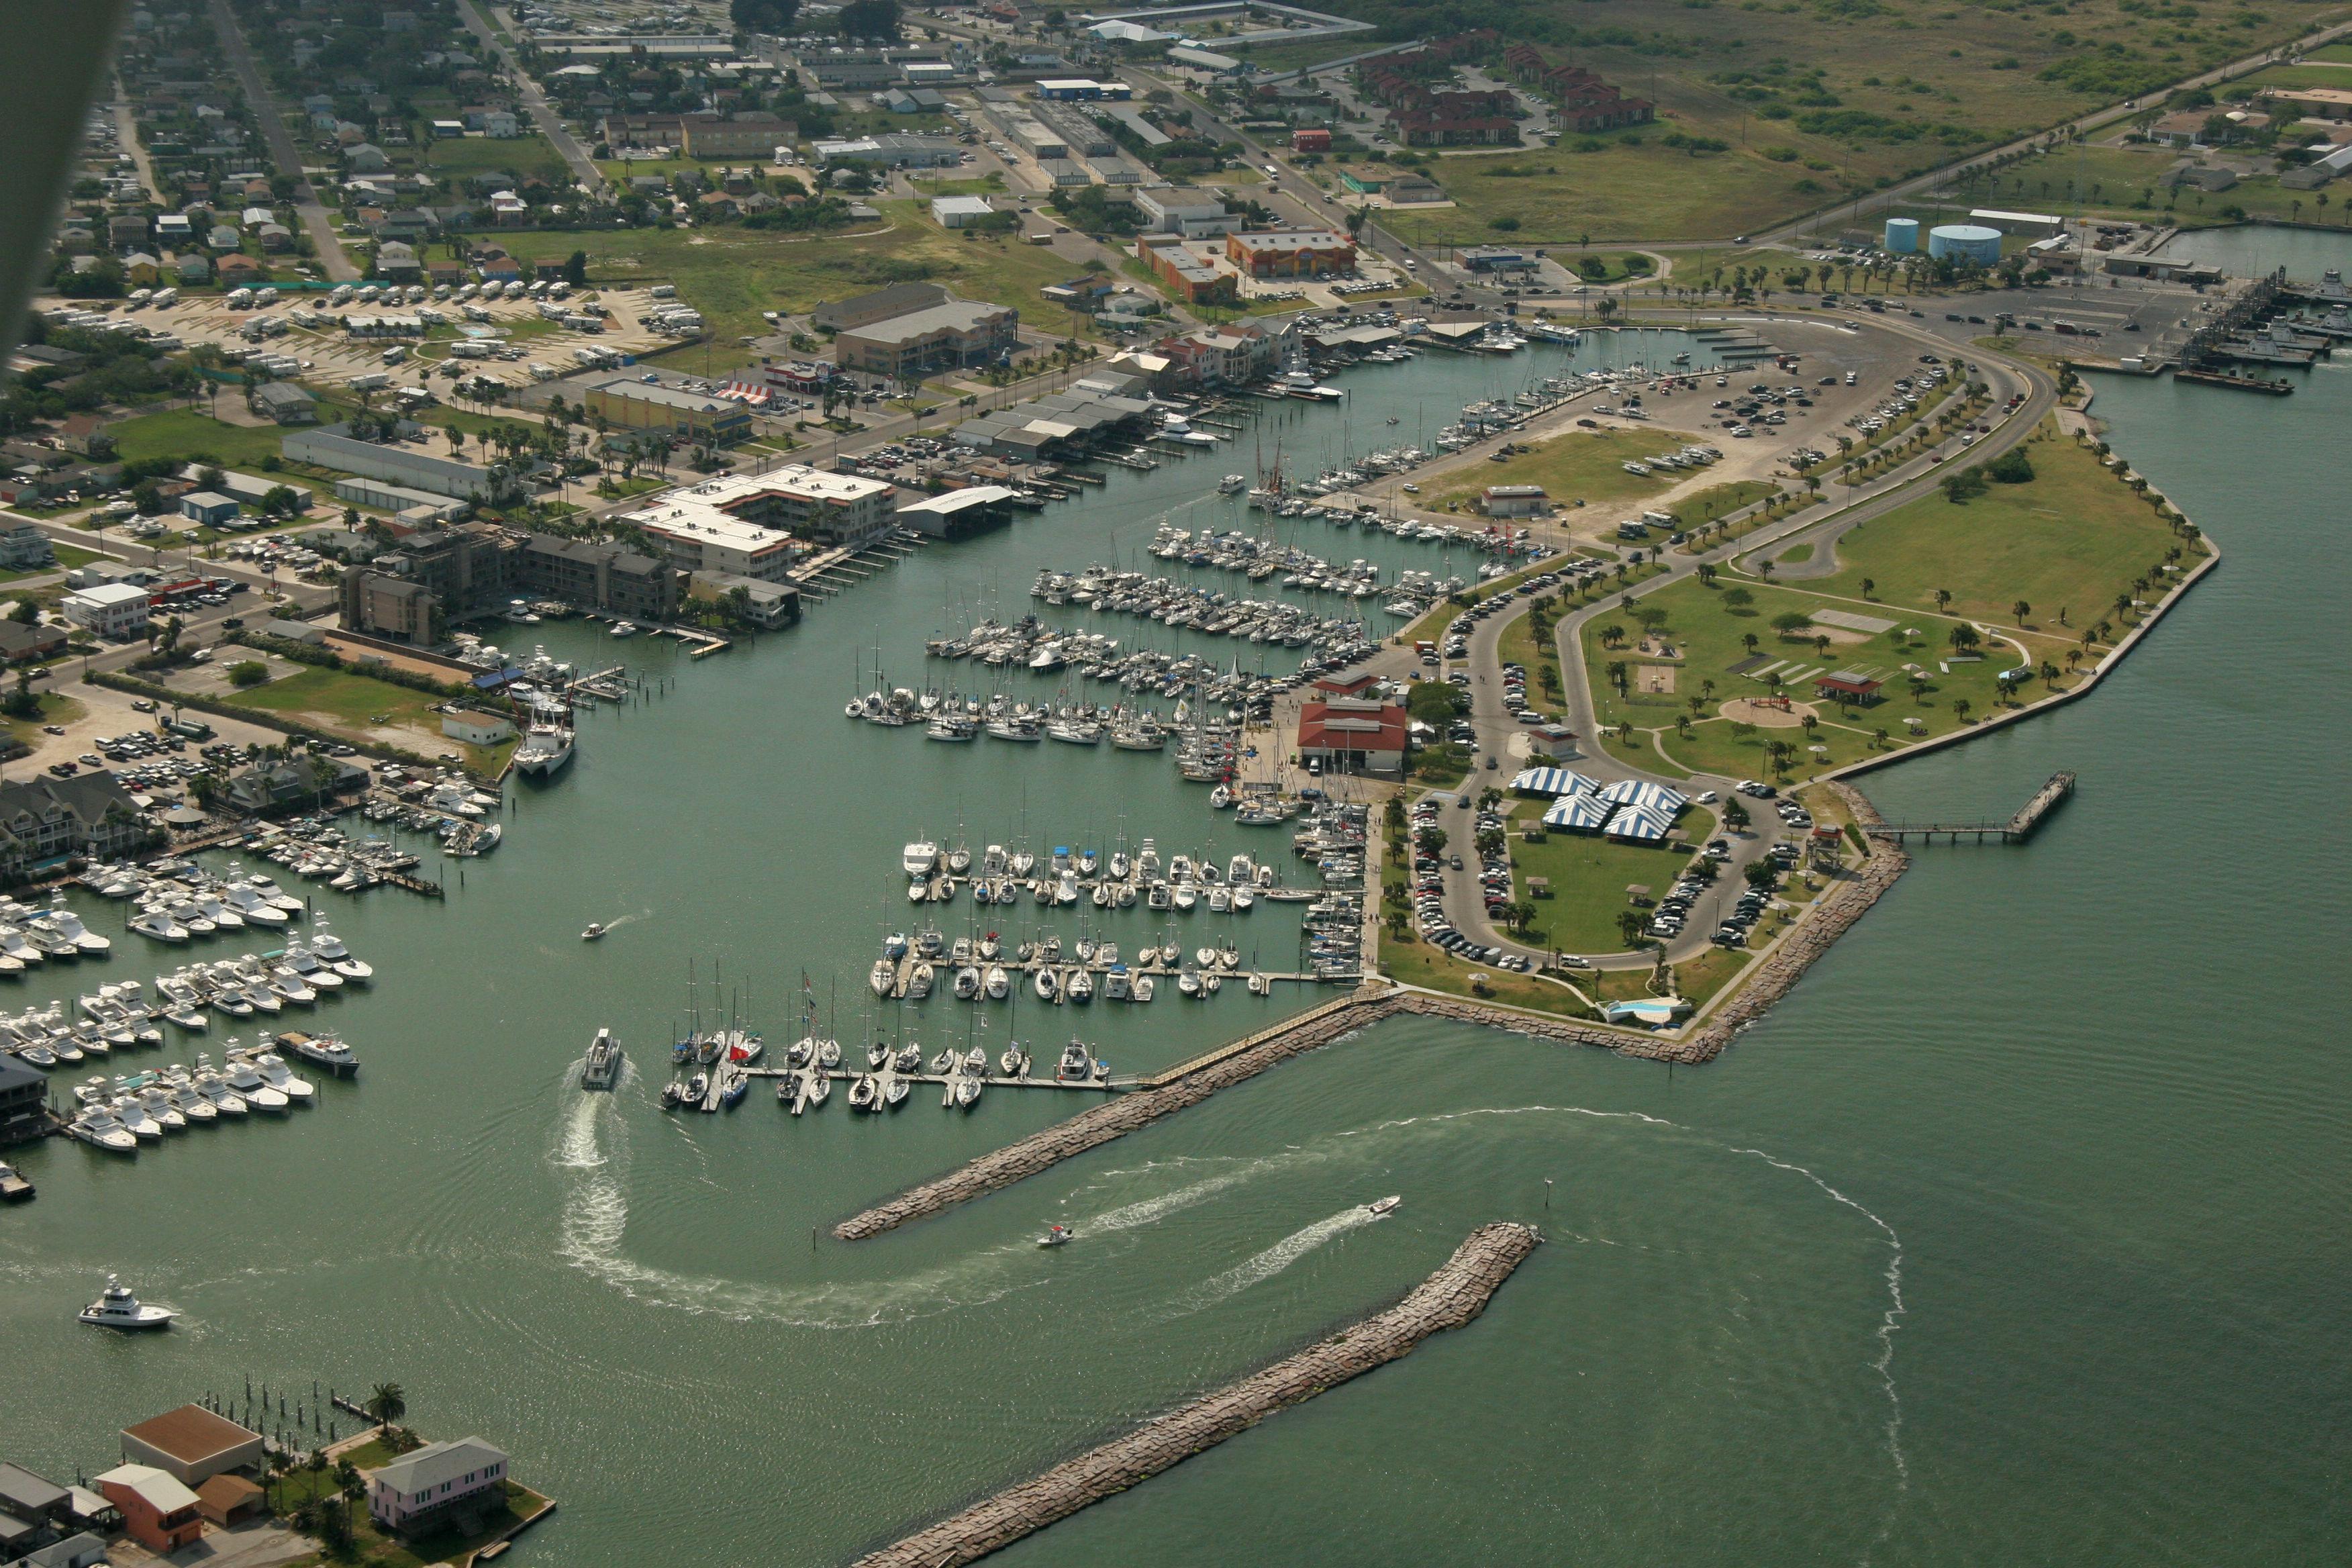 Port aransas city harbor in port aransas tx united for Port a texas